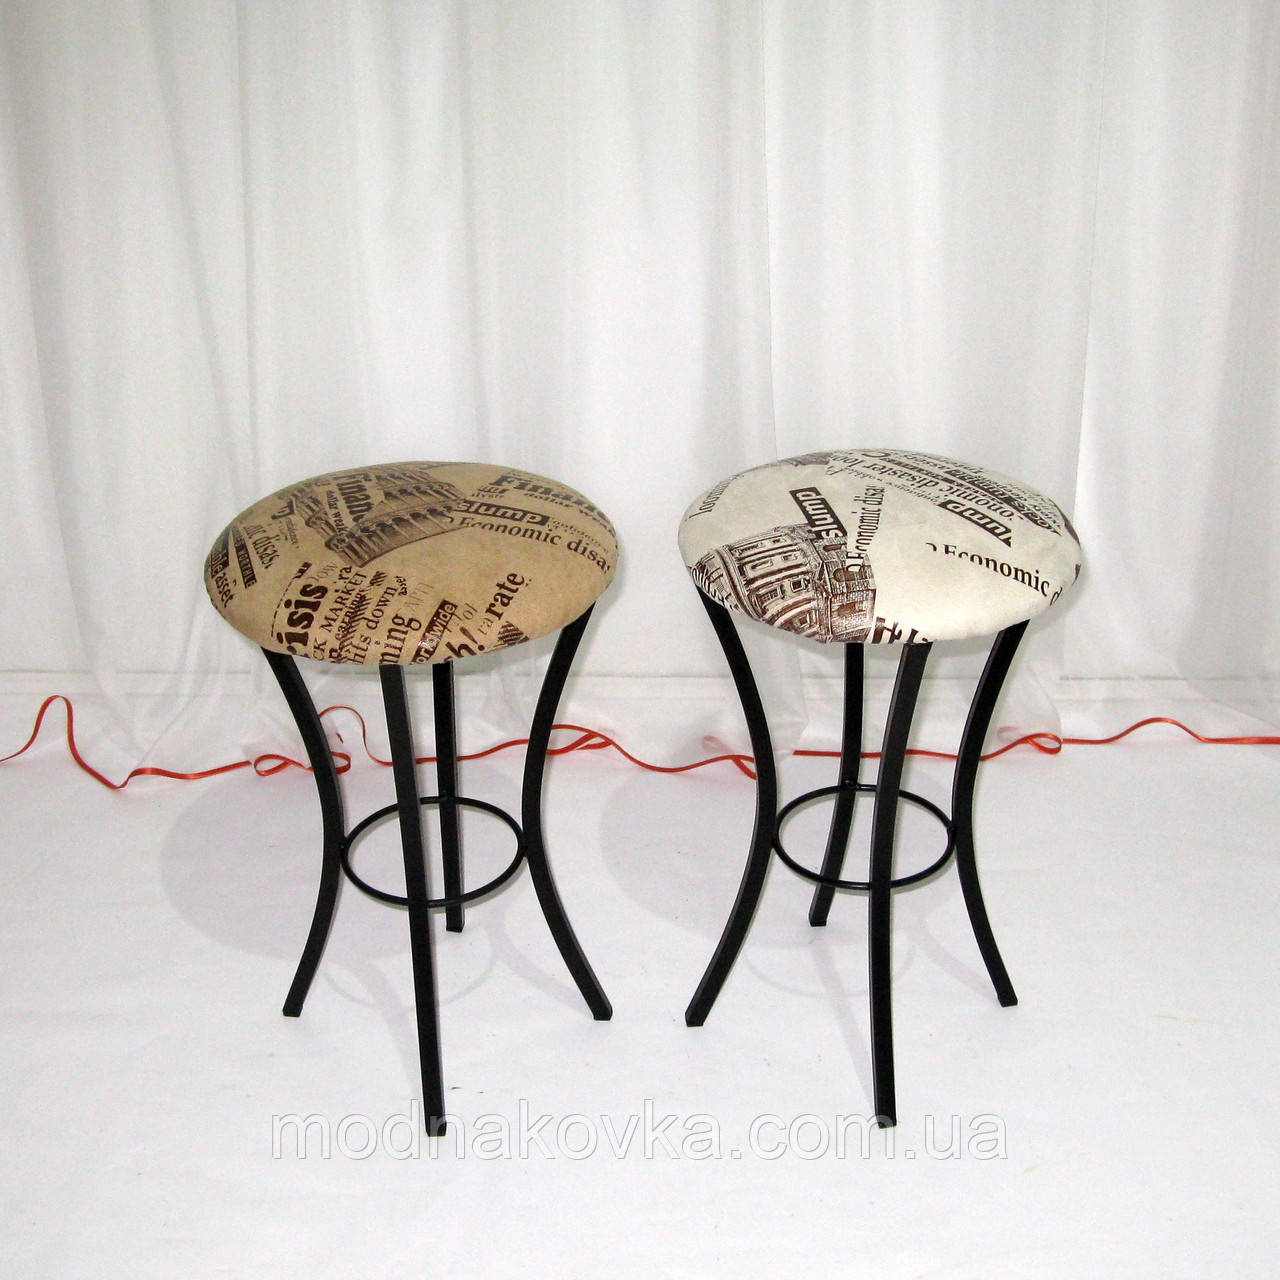 Металлический кухонный табурет, кофейный кожзам рисунок